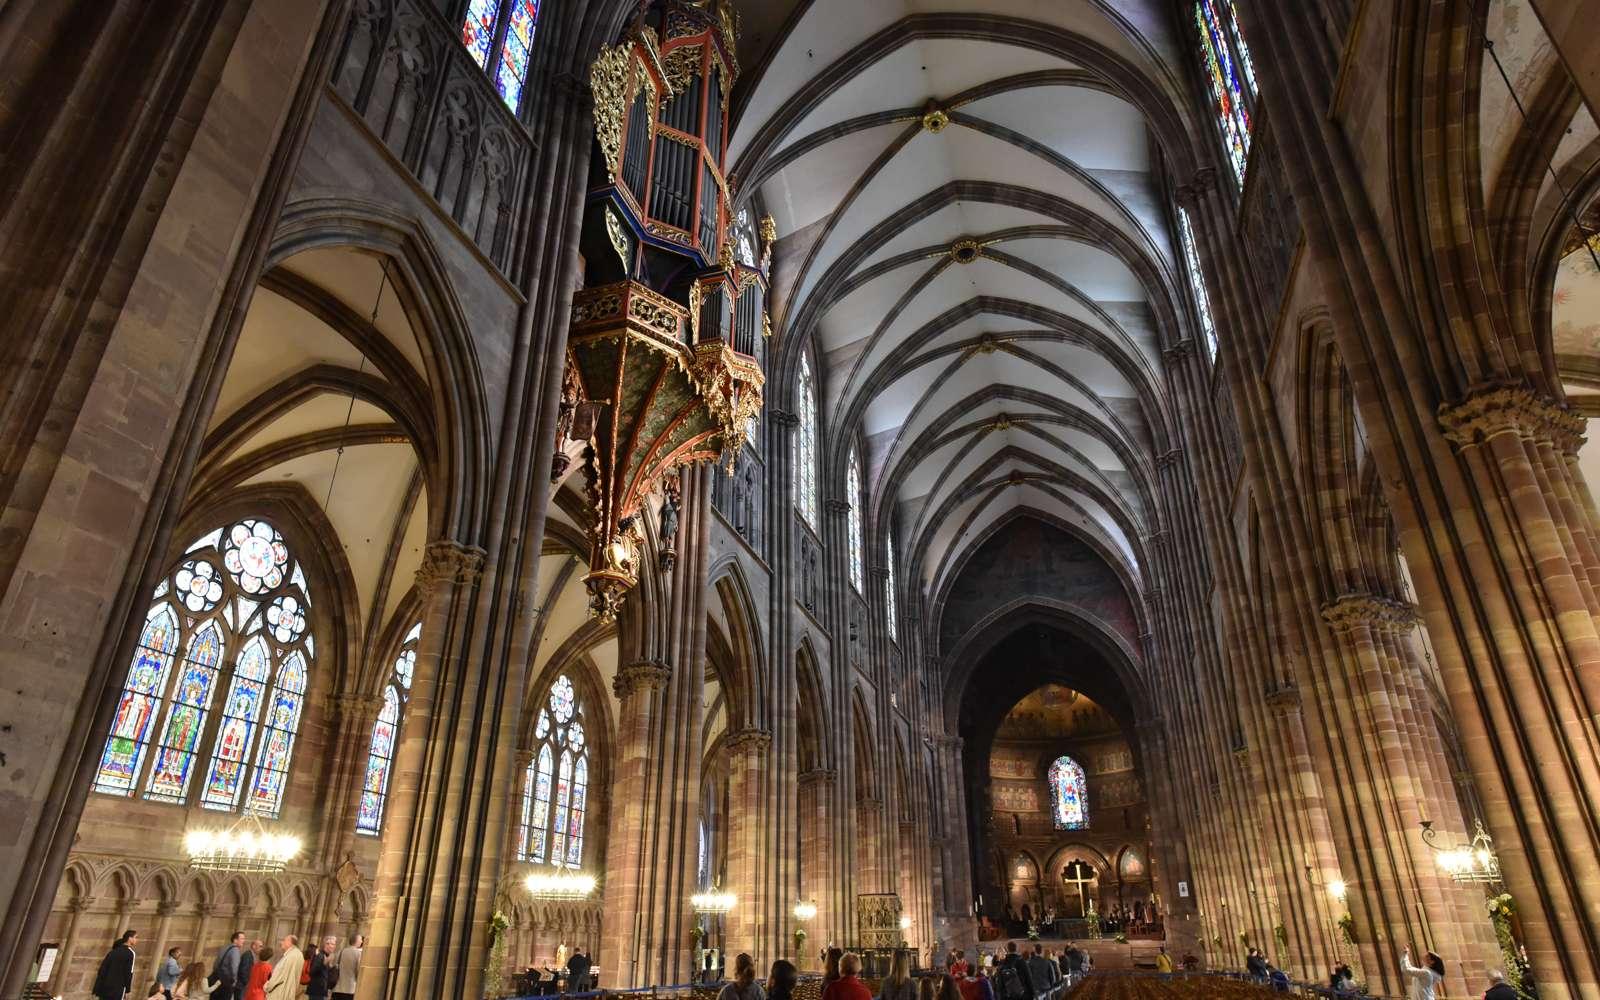 La nef de la cathédrale de Strasbourg. © hminnx, Flickr